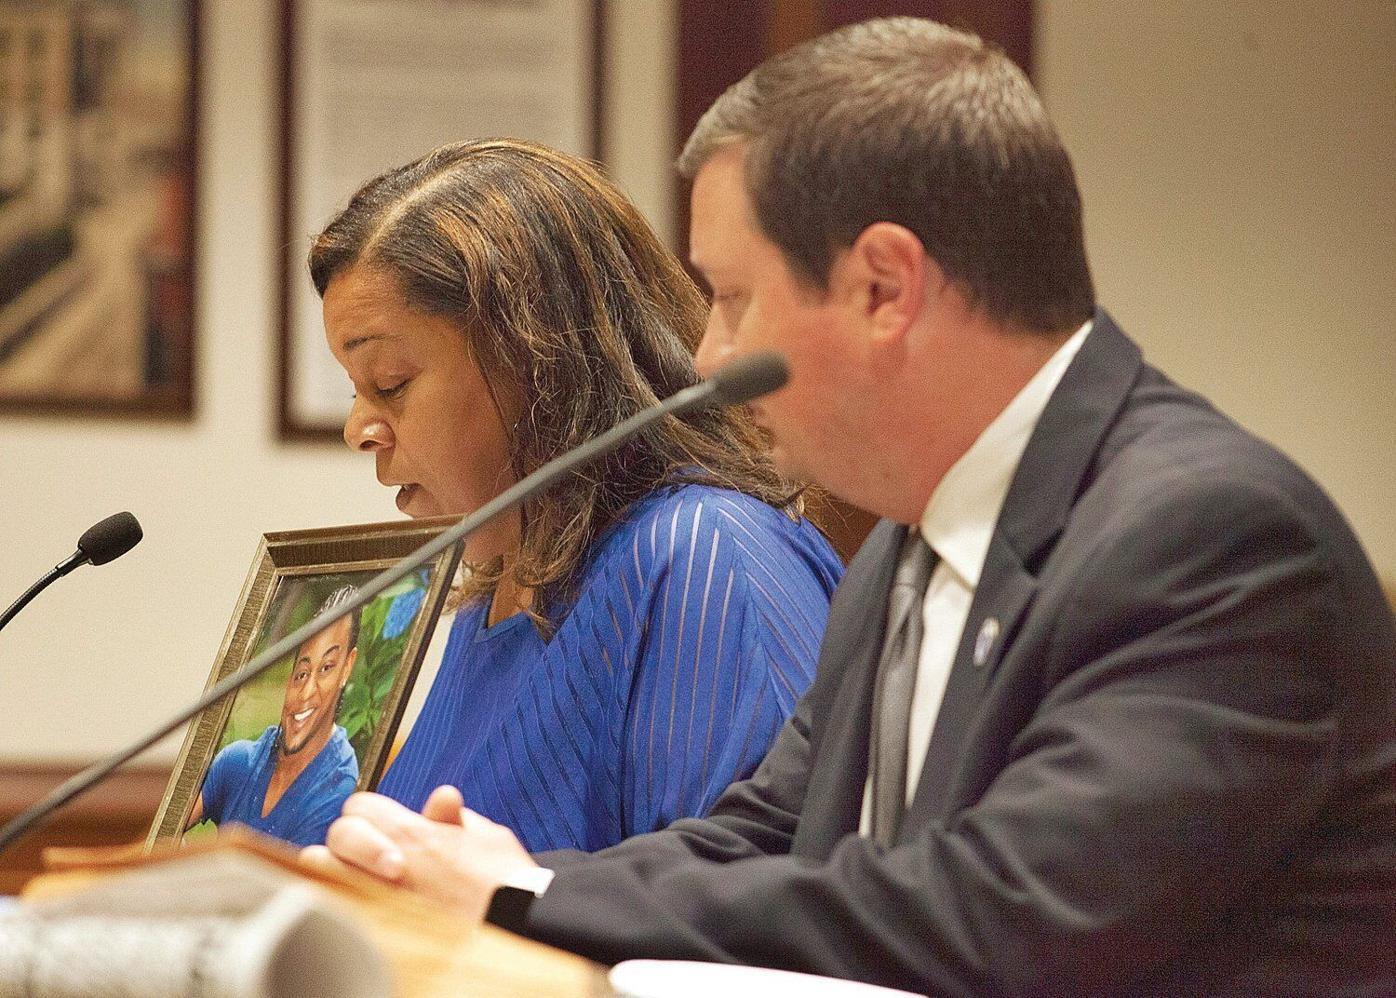 Legislative panel hears ideas to curb opioid deaths in Mass.